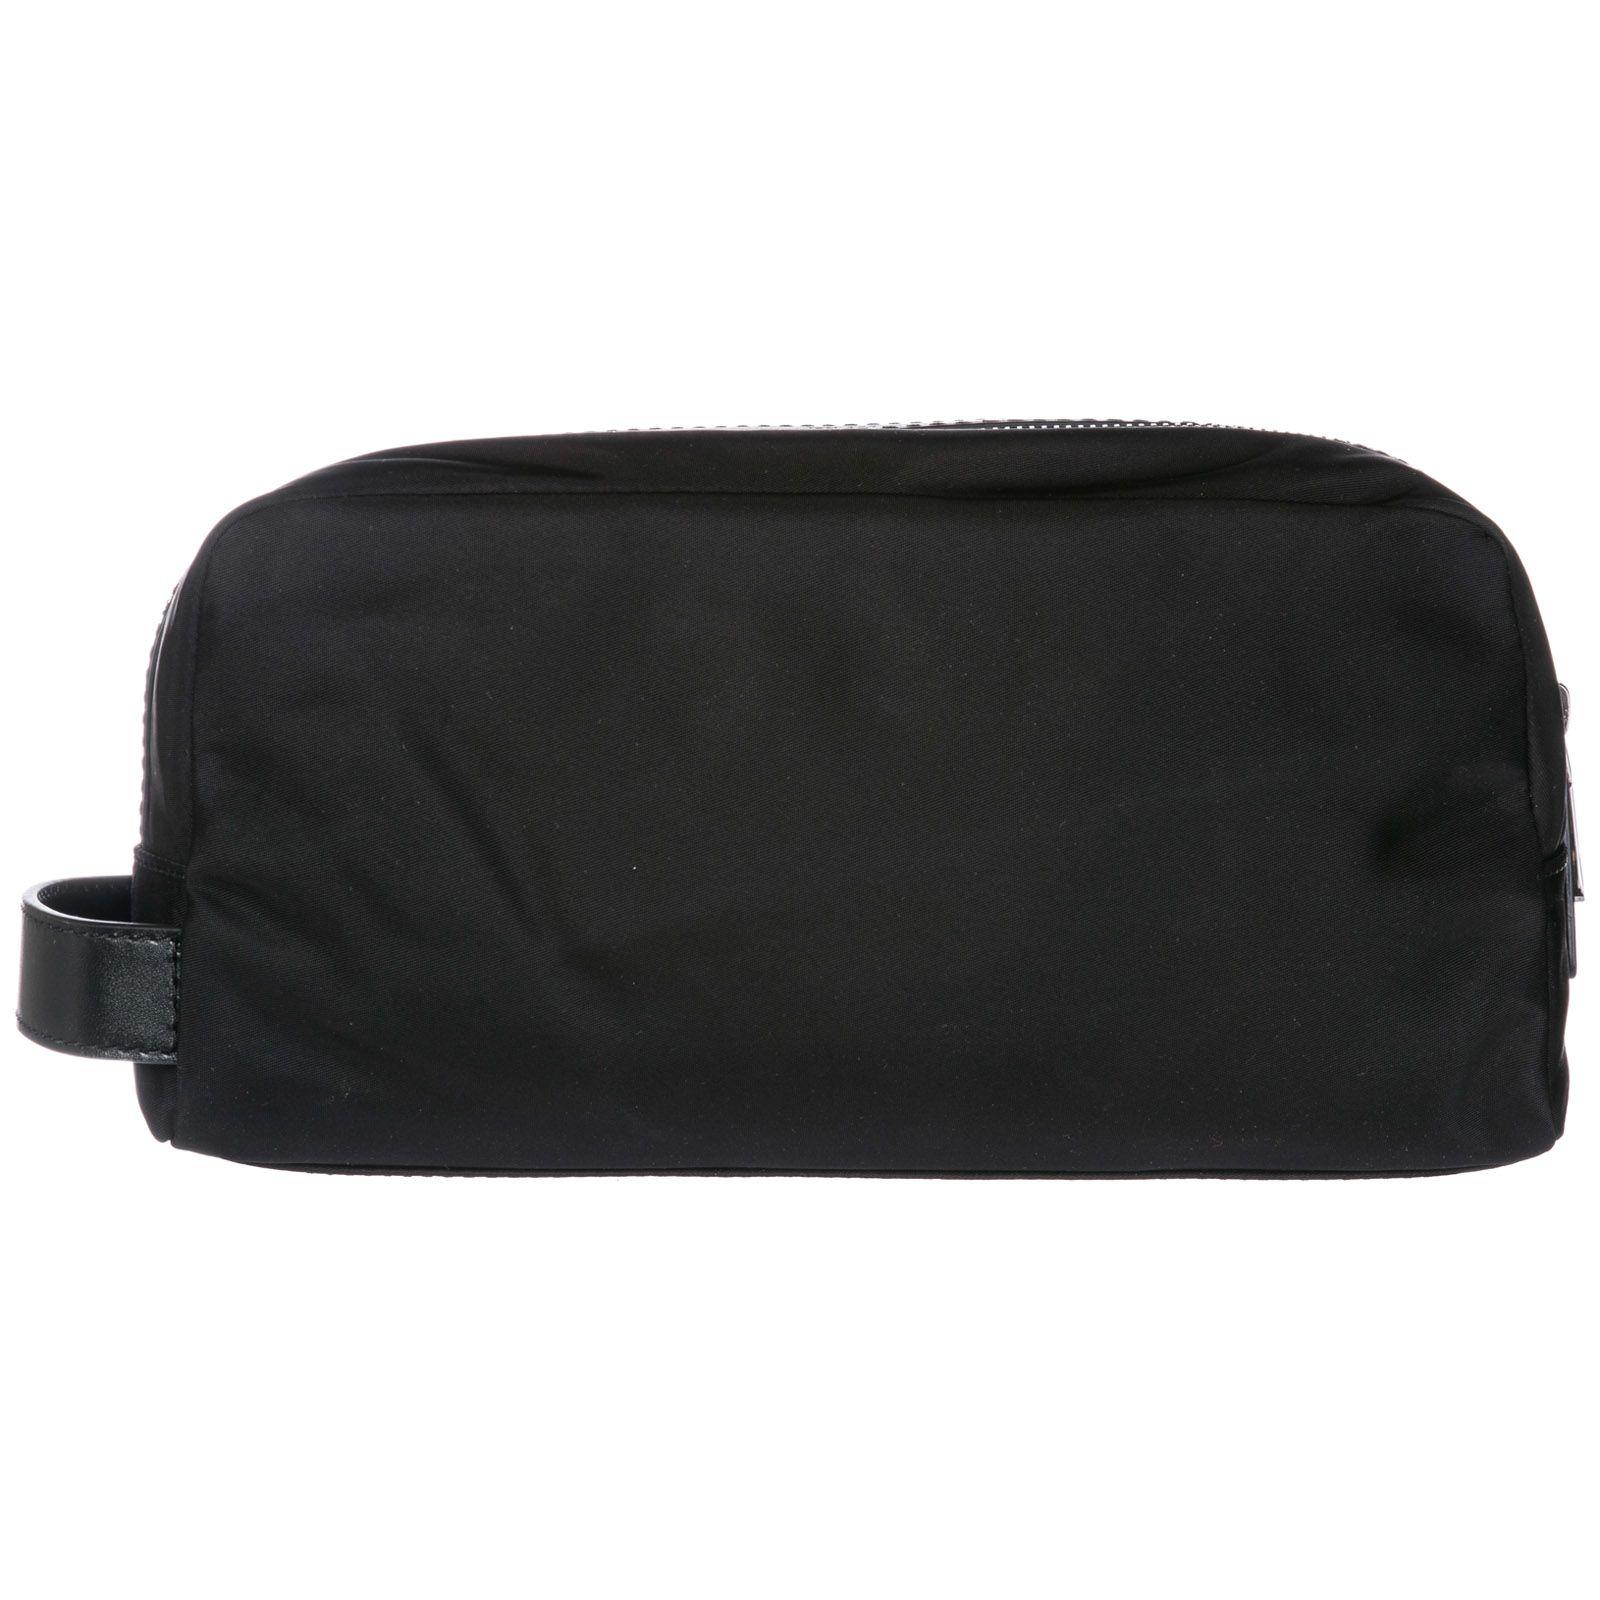 Michael Kors Travel Michael Kors  Travel Toiletries Beauty Case Wash Bag In Nylon Kent